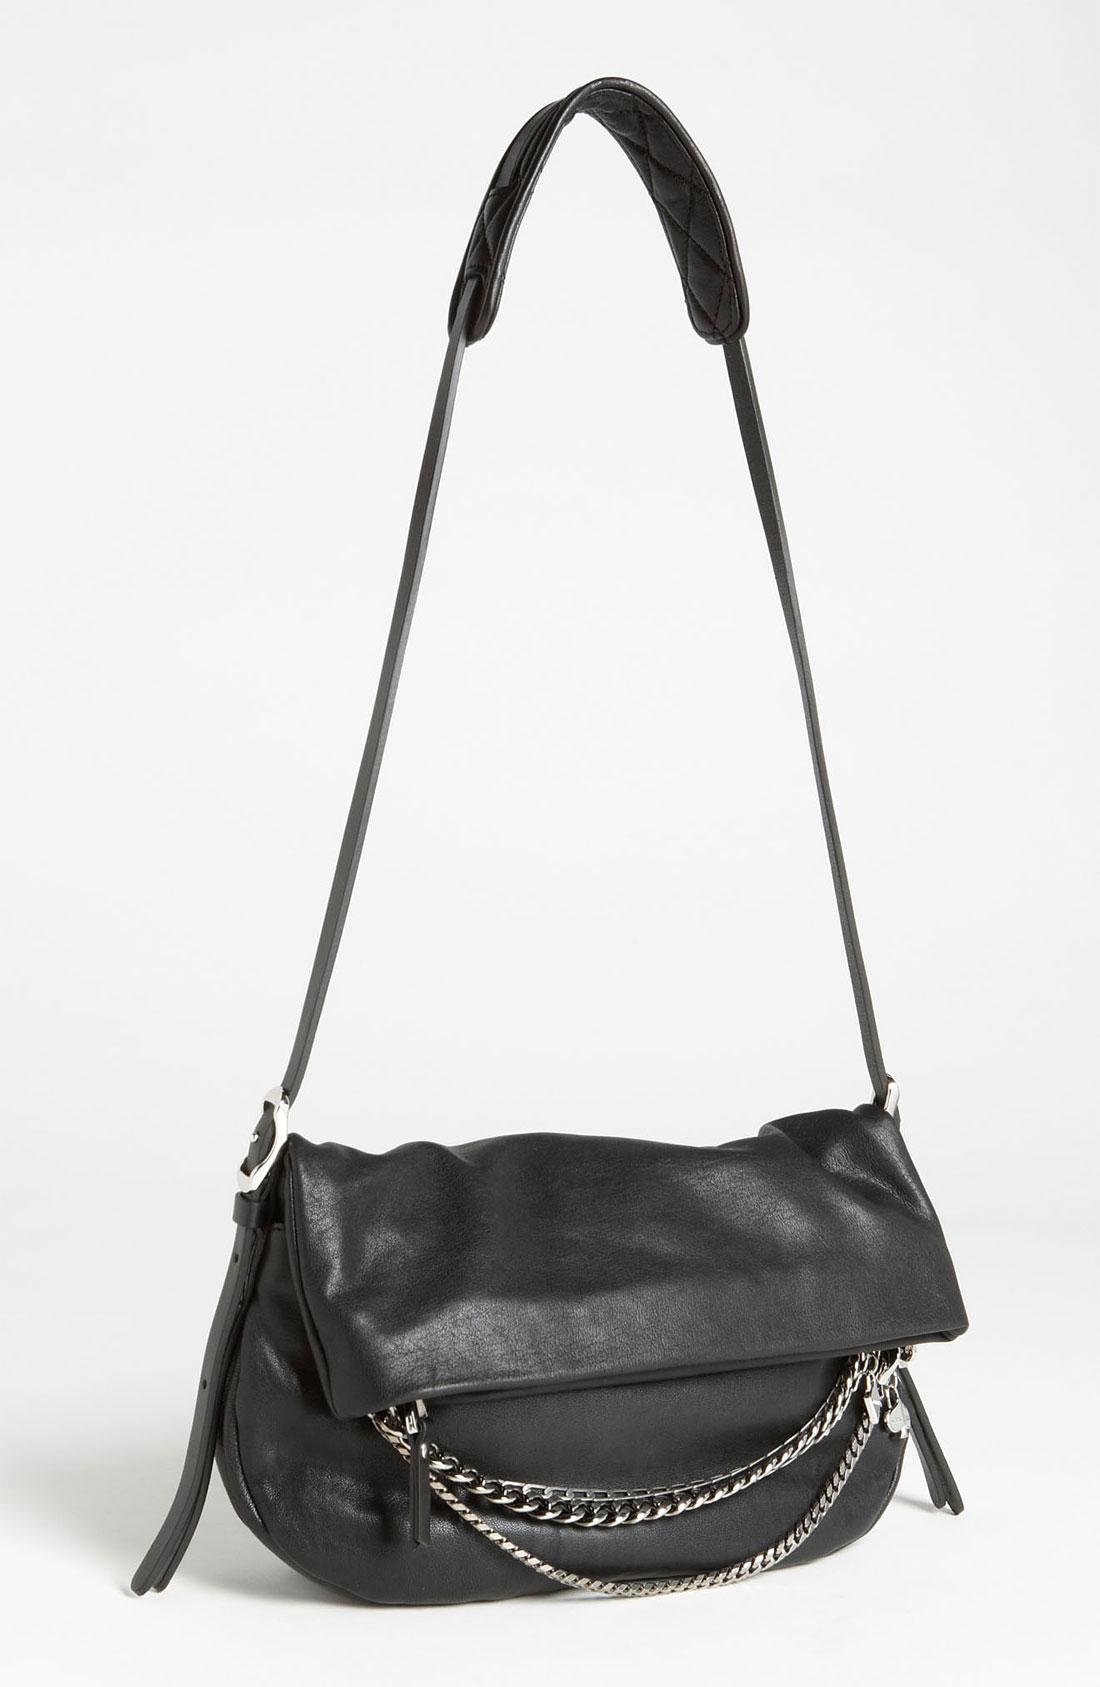 Jimmy Choo Biker Small Leather Crossbody Bag in Black | Lyst